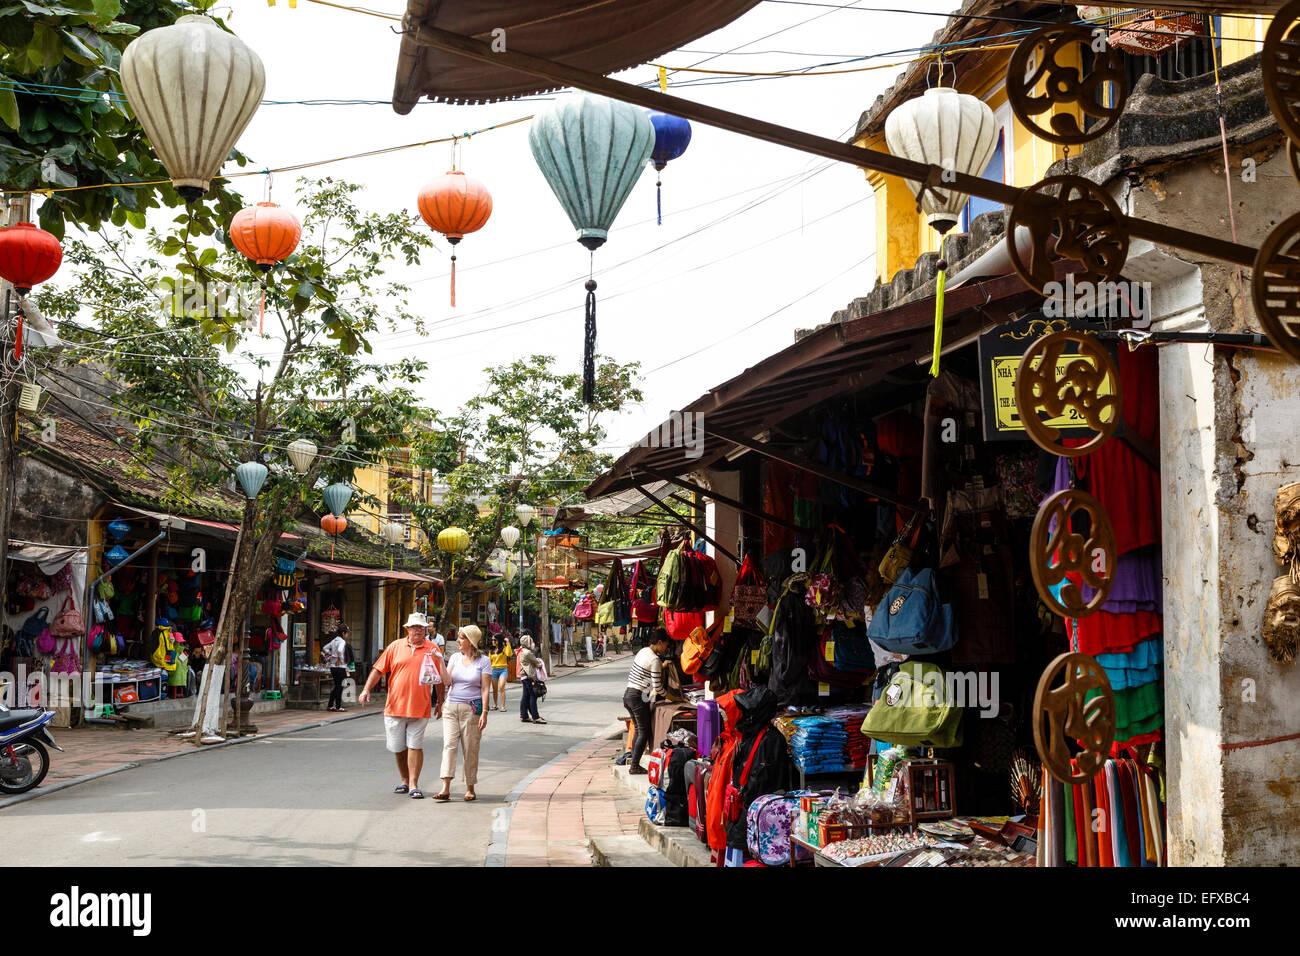 Scena di strada, Hoi An, Vietnam. Immagini Stock